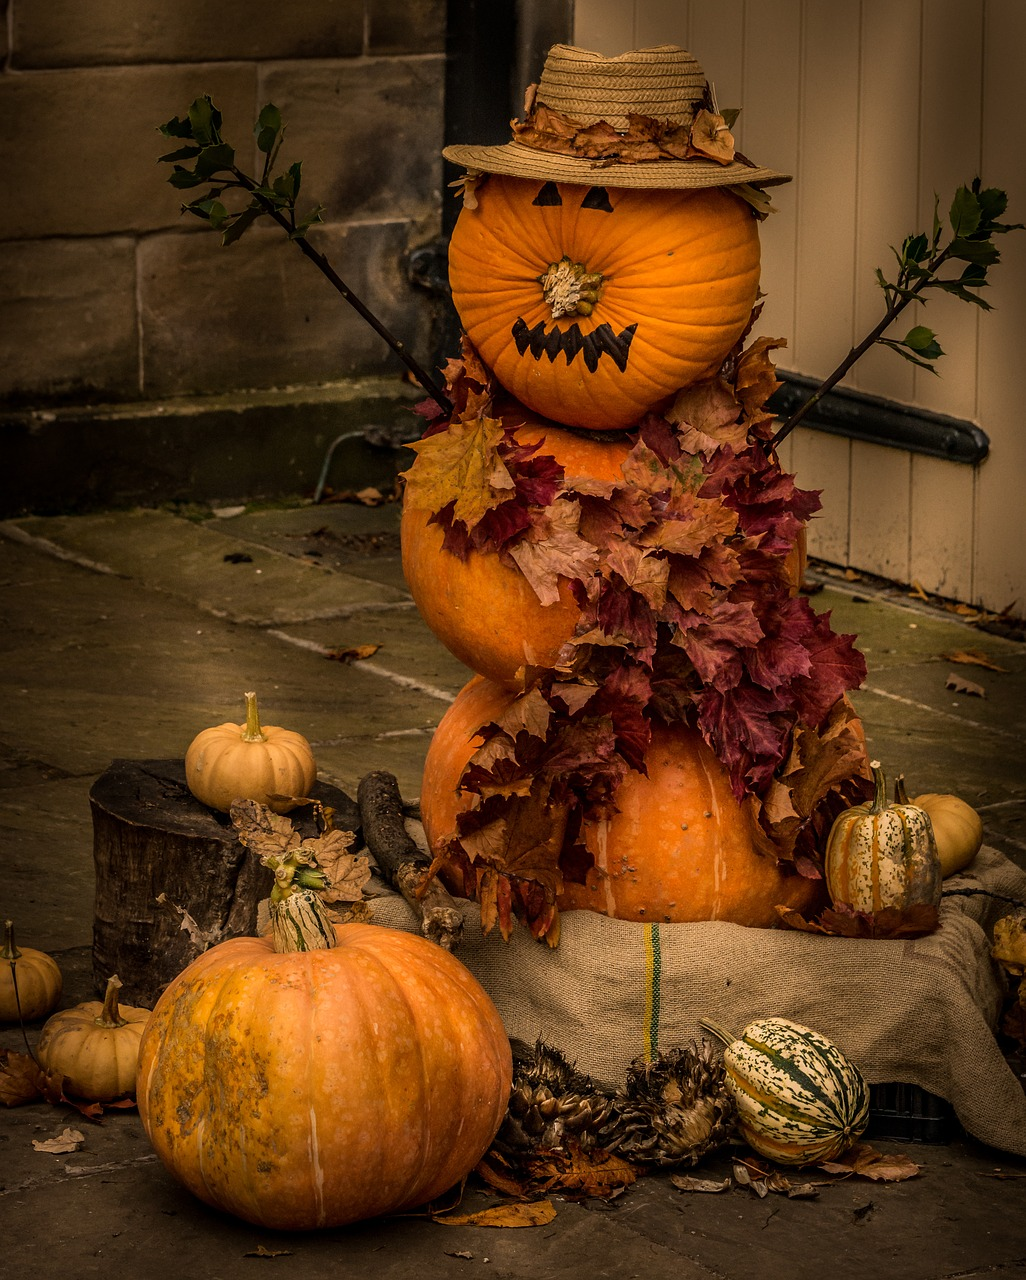 Dag Halloween.Halloween Seasonal Pumpkin Face Spooky Free Photo From